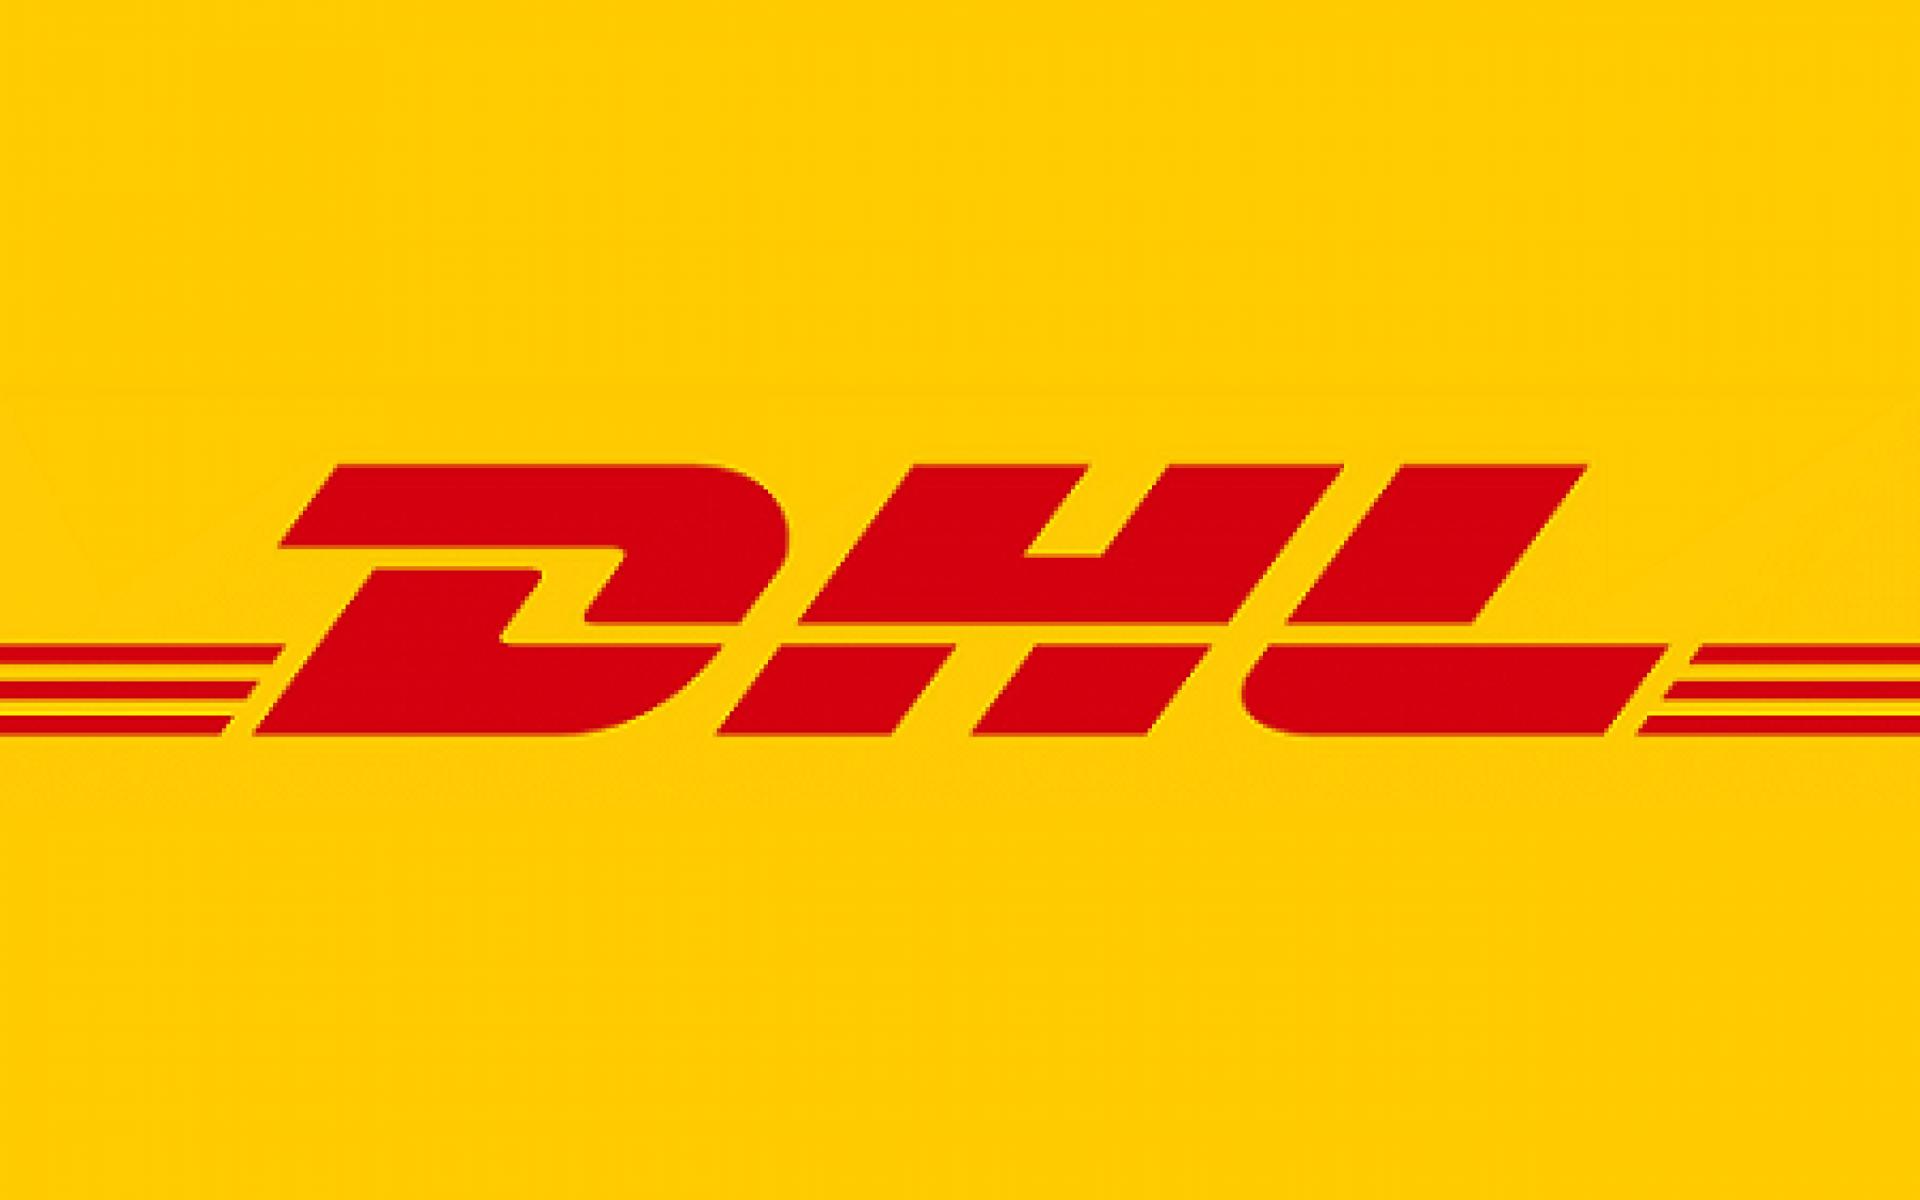 DHL Company Logo Wallpaper PaperPull 1920x1200